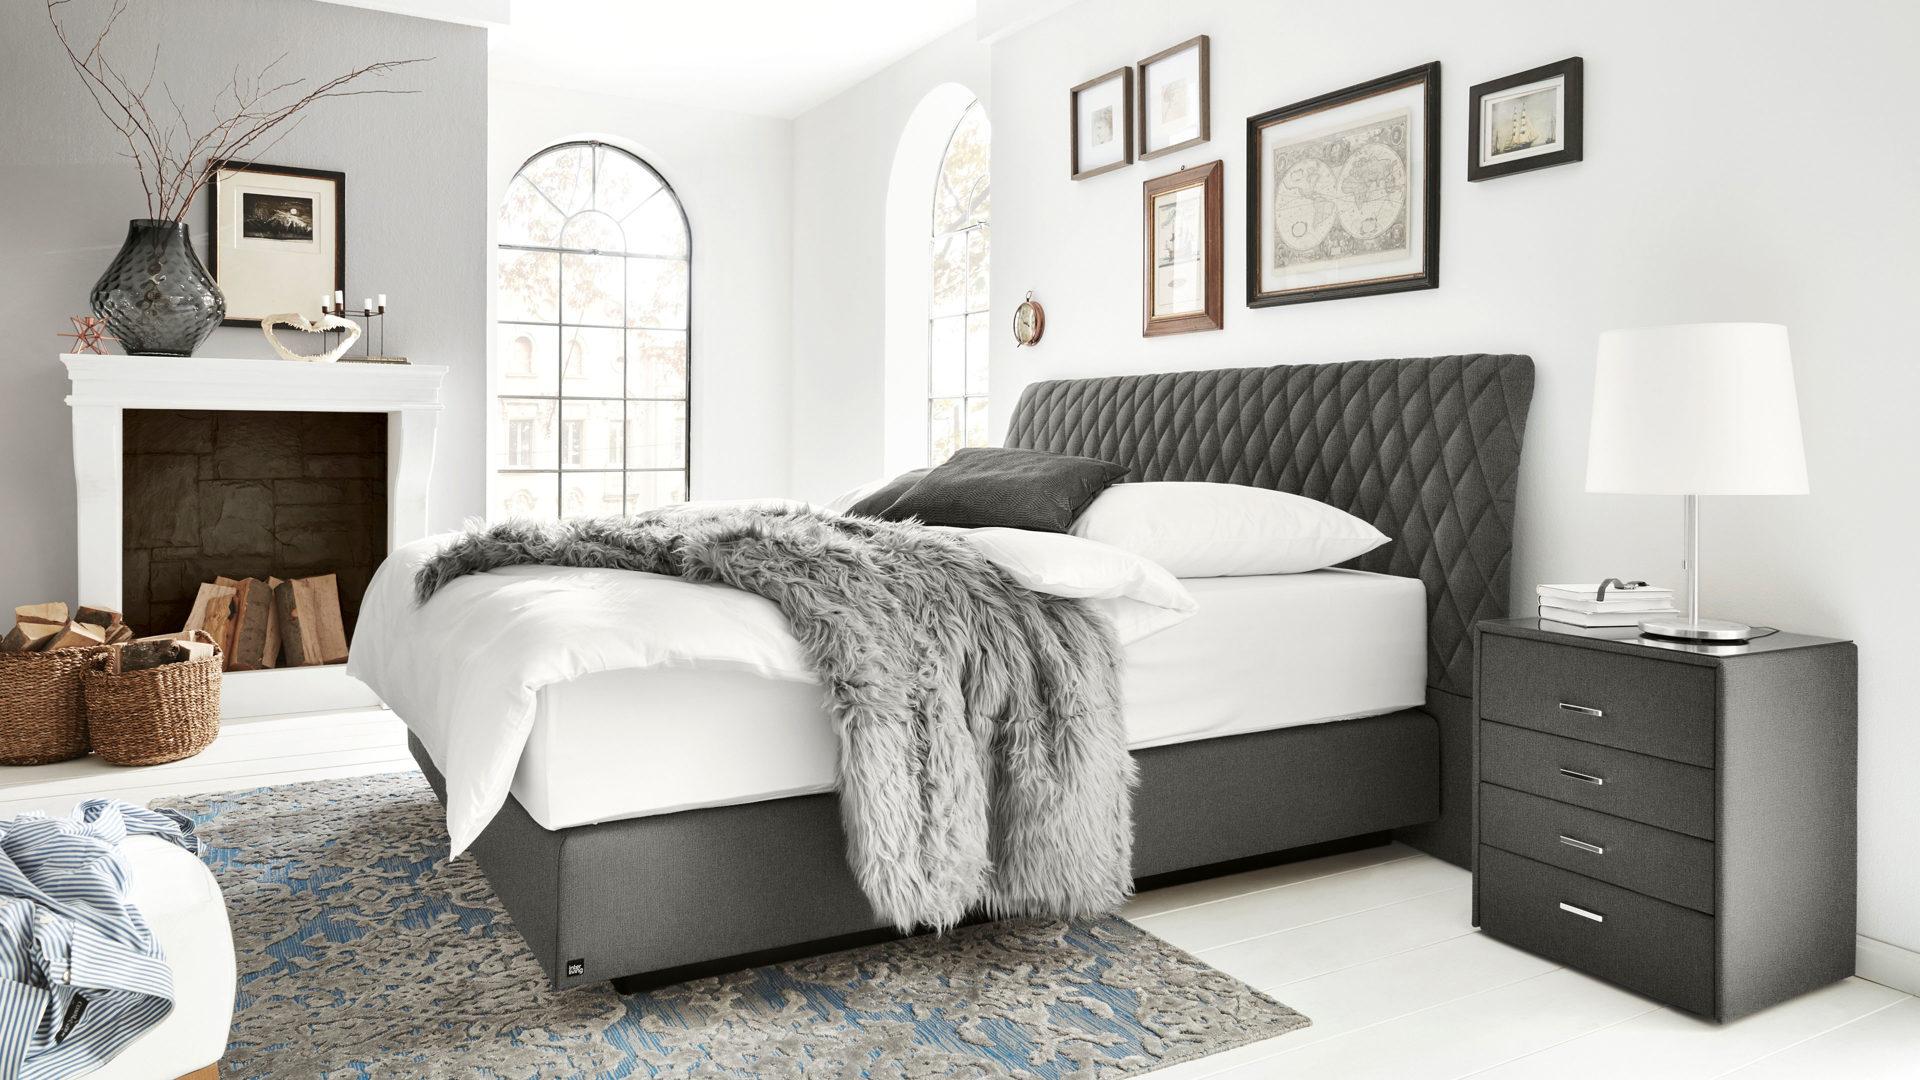 Interliving Boxspringbett Serie 1403, grauer Stoffbezug Neo 484500 –  Liegefläche ca. 180 x 200 cm